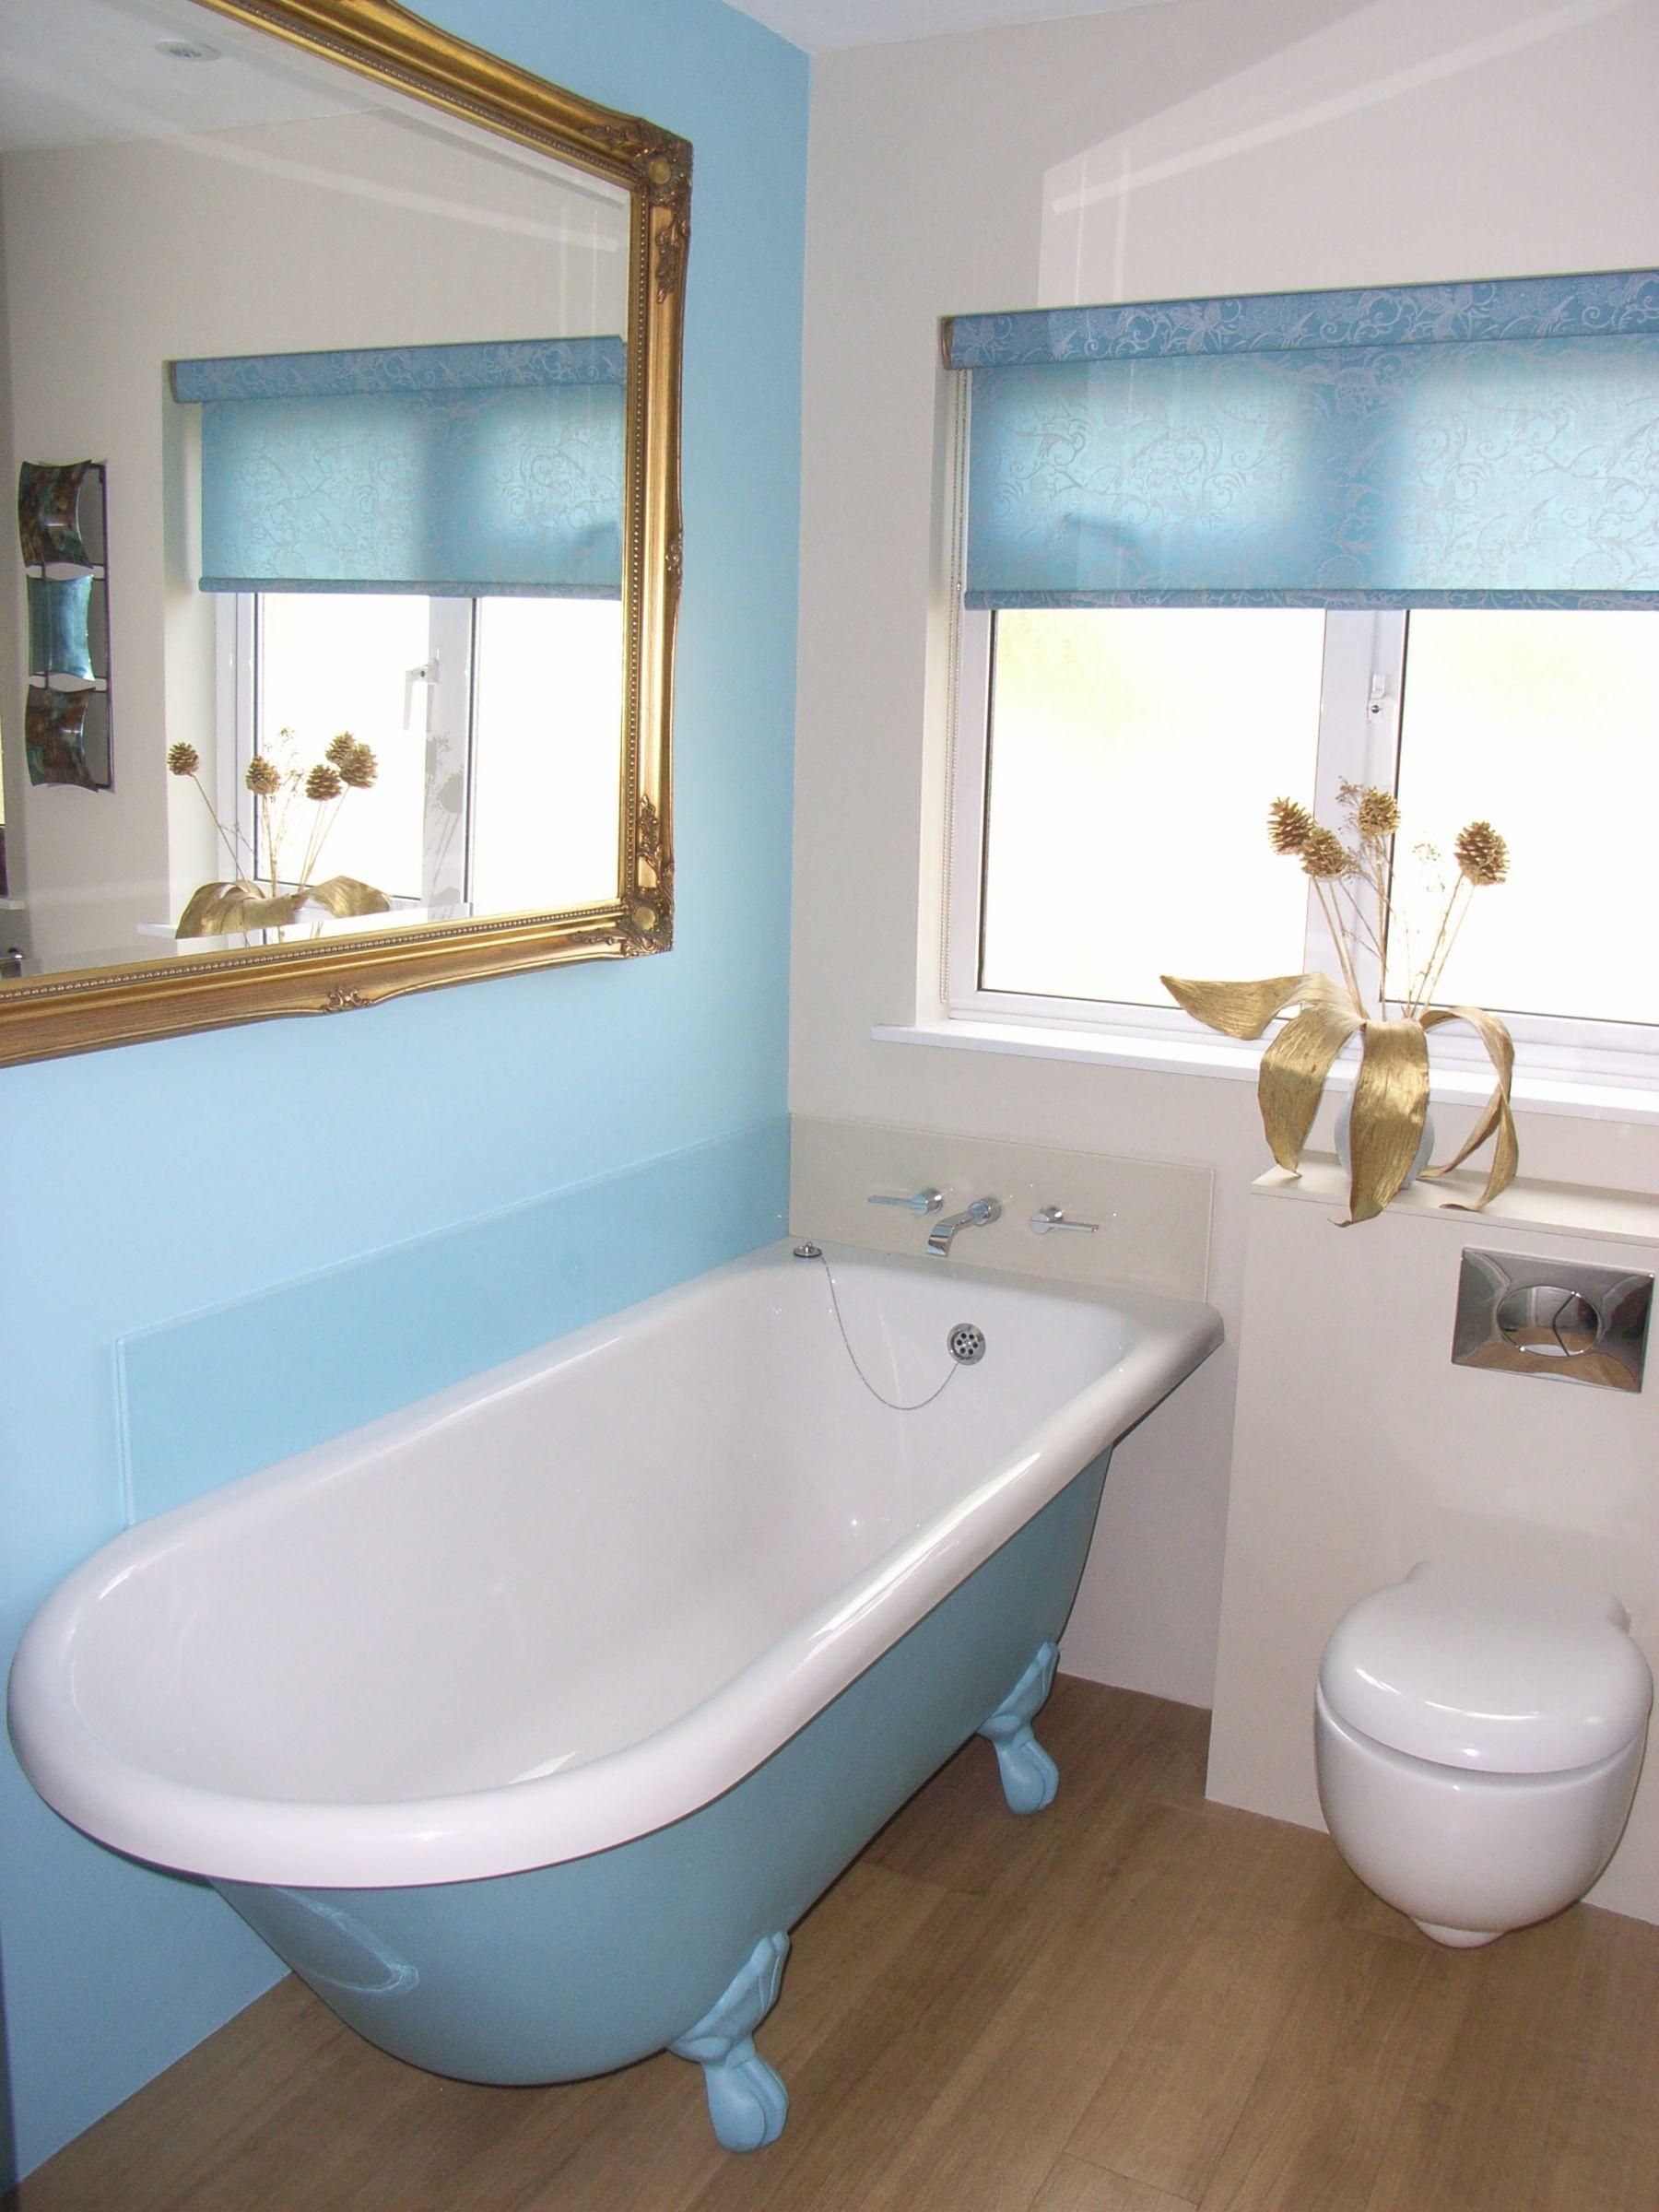 tiled in freestanding bath